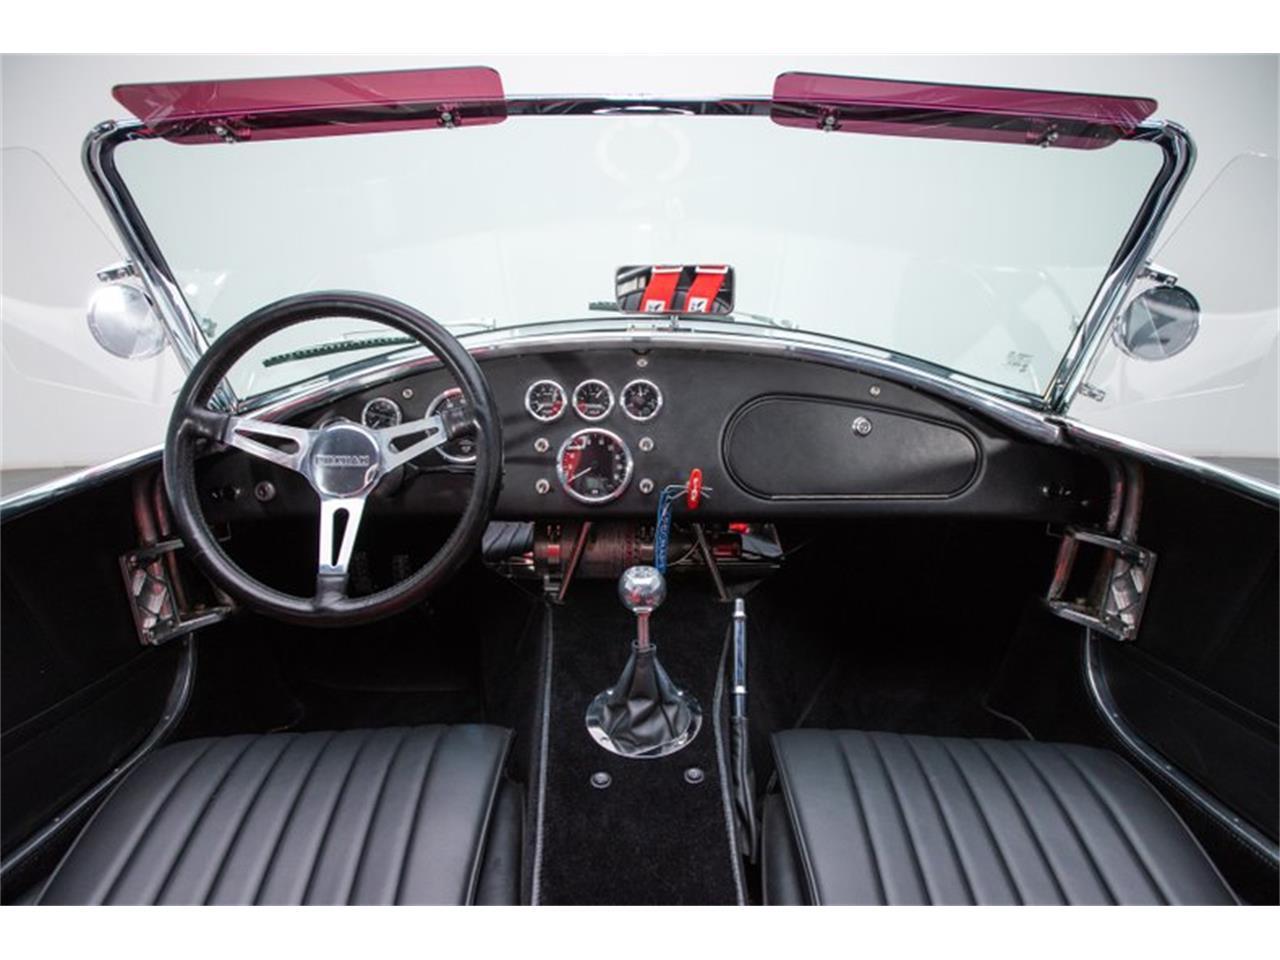 Large Picture of Classic '65 Kirkham Cobra located in Charlotte North Carolina - $159,900.00 - PUR4